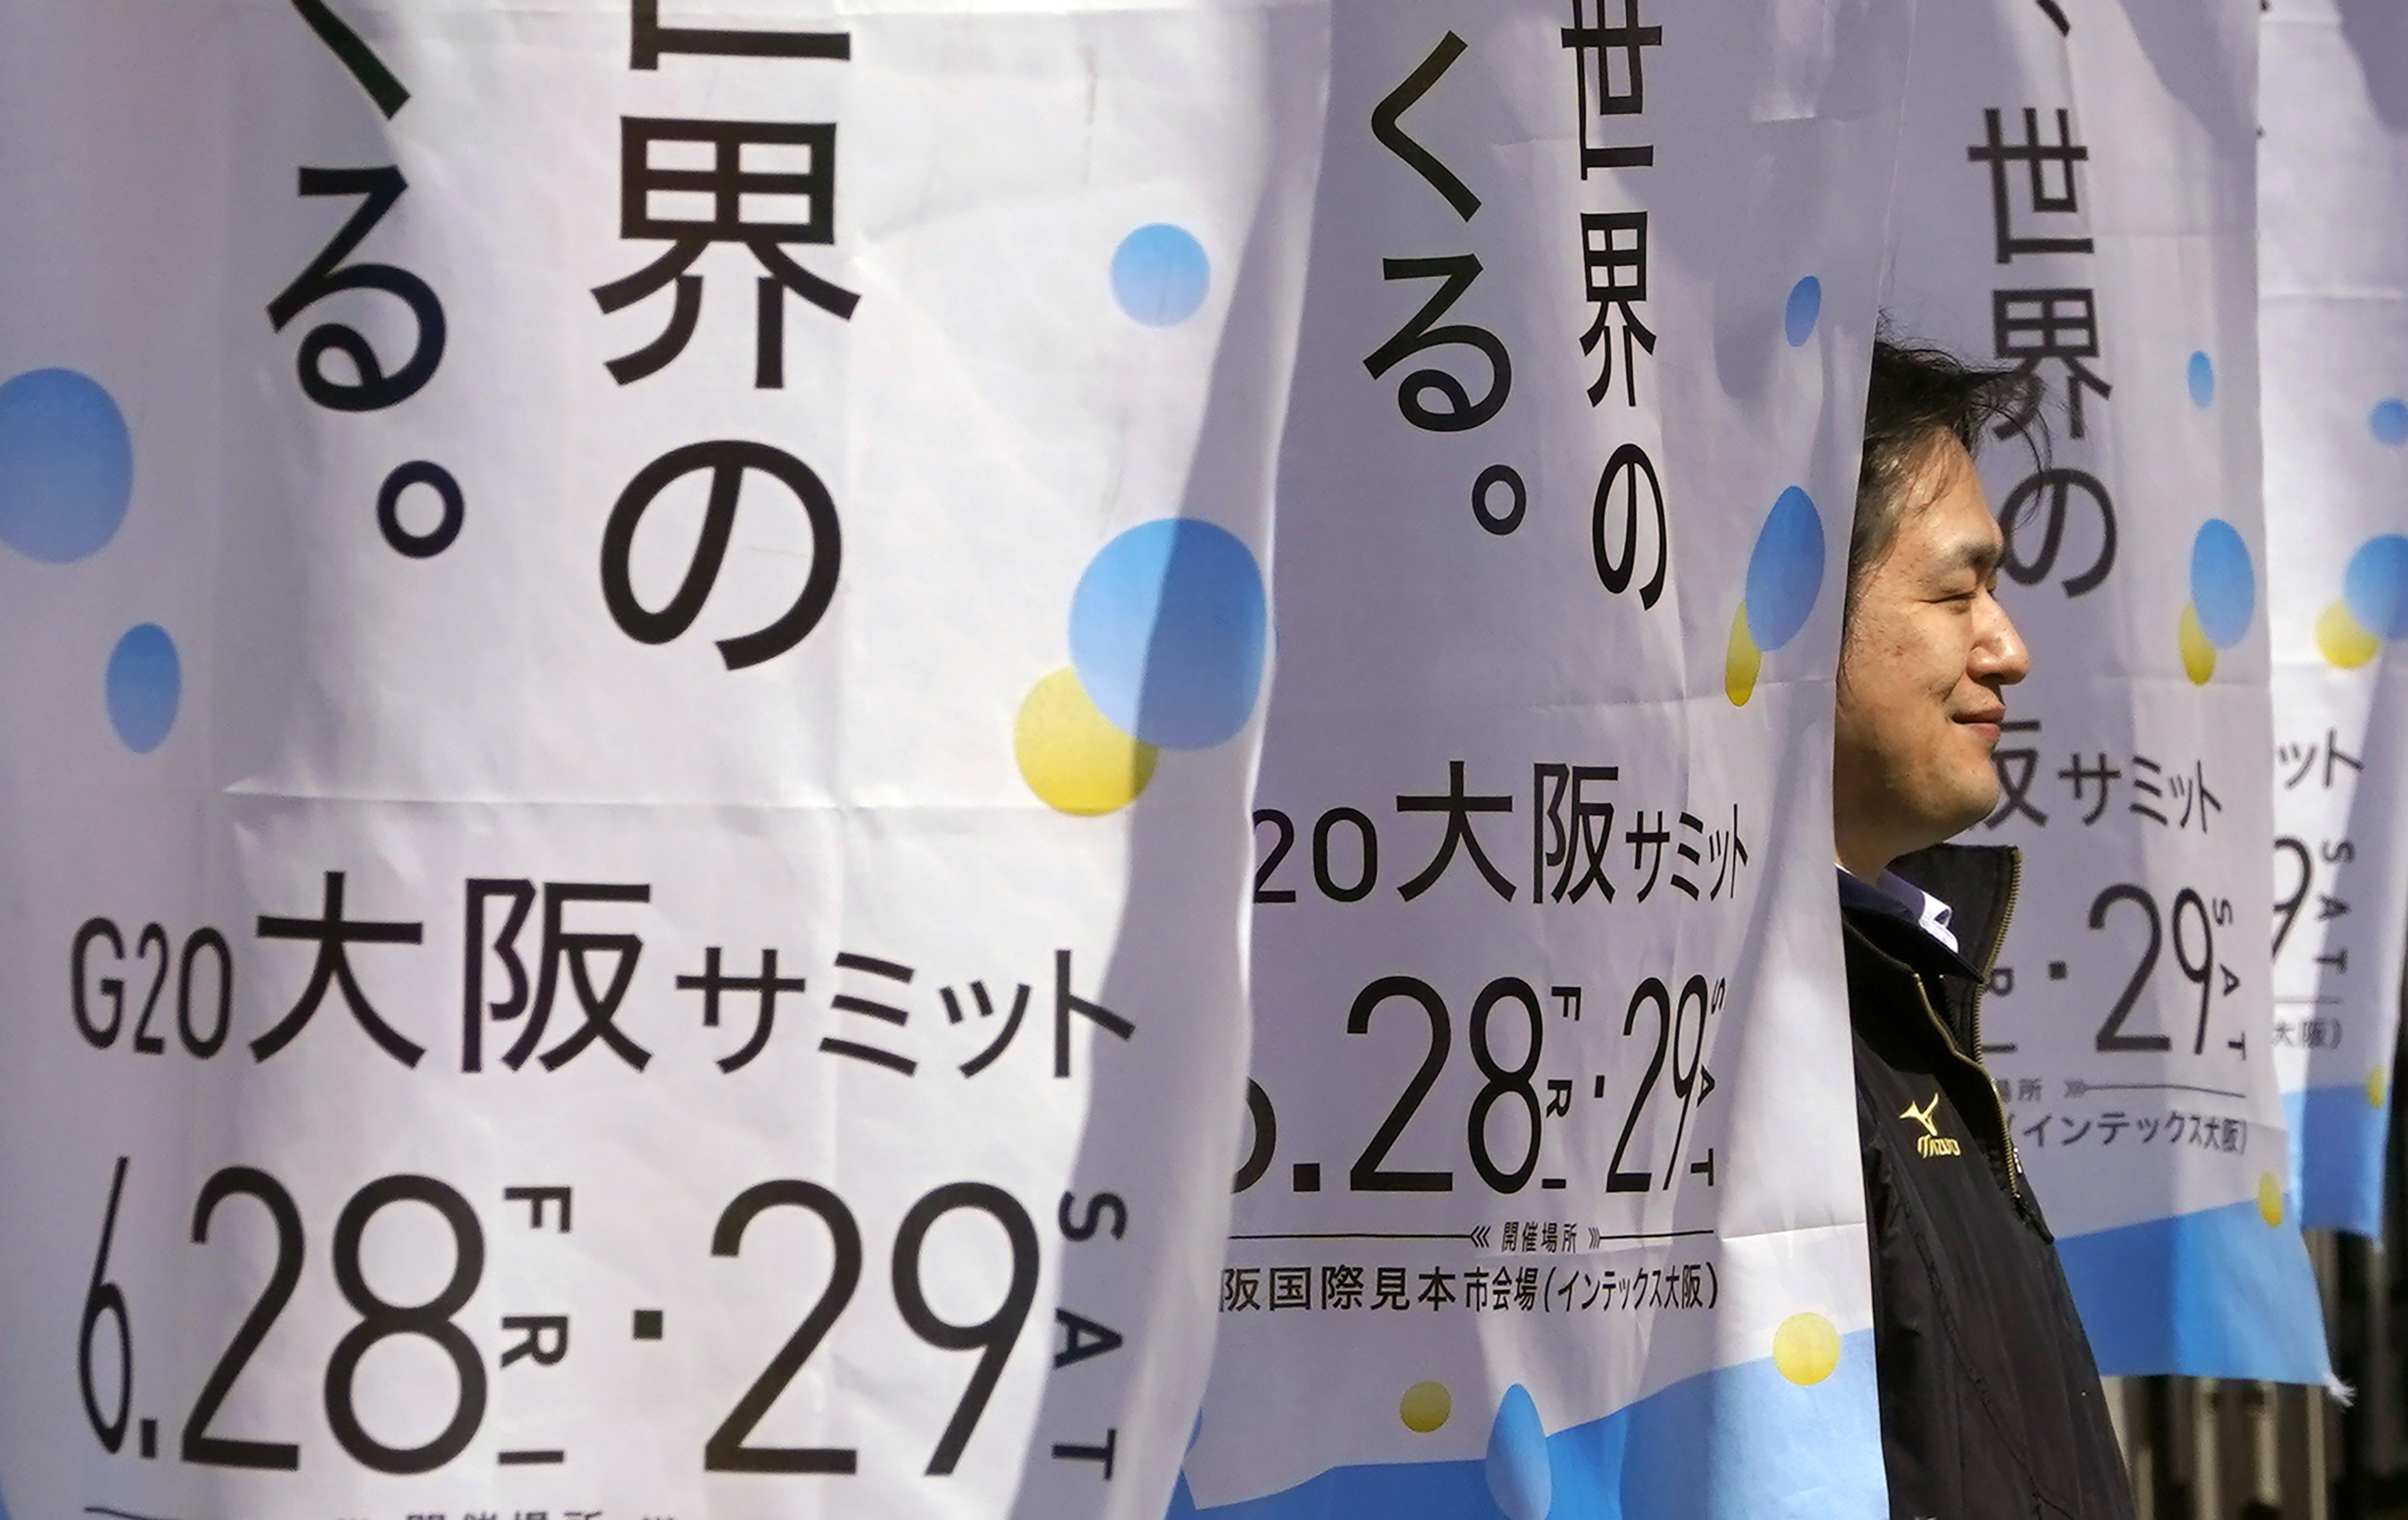 <p>Фото © Shizuo Kambayashi / AP Images for Kansai Promotion Council for the 2019 G20 Osaka Summit</p>